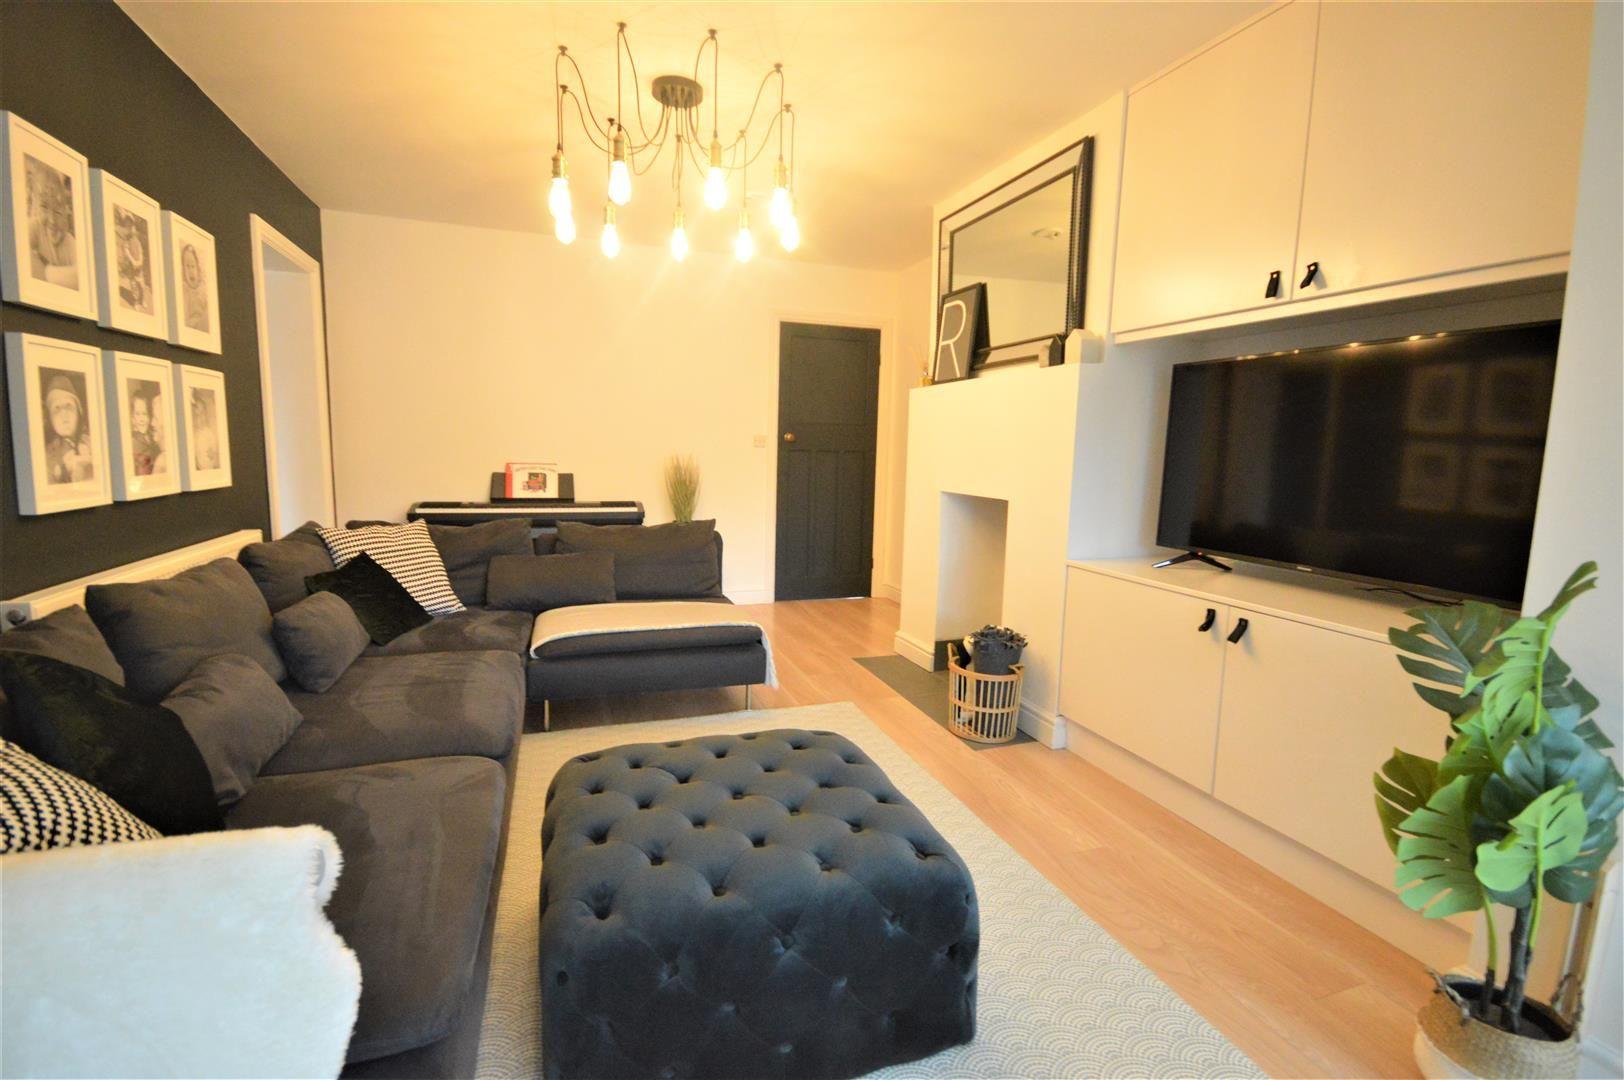 5 bed detached for sale in Leominster  - Property Image 6